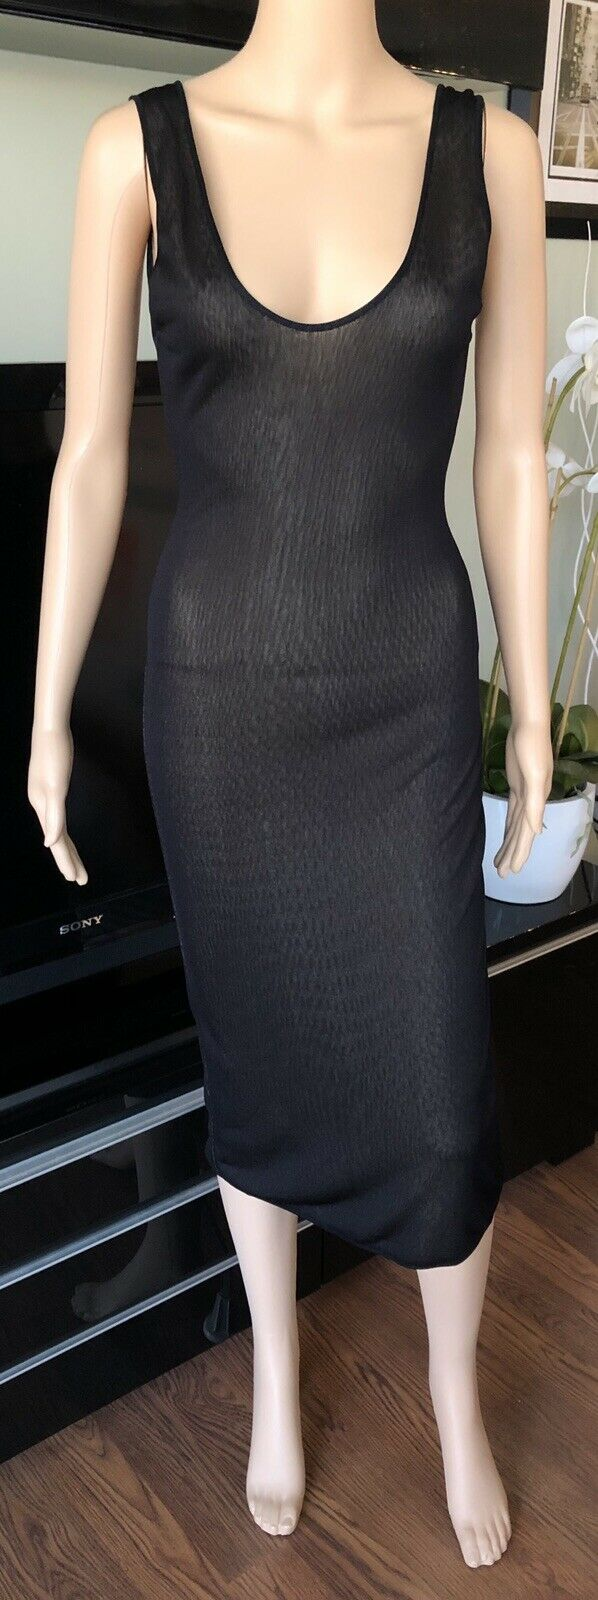 Azzedine Alaia Sheer Bodycon Open Back Dress S/M - image 2